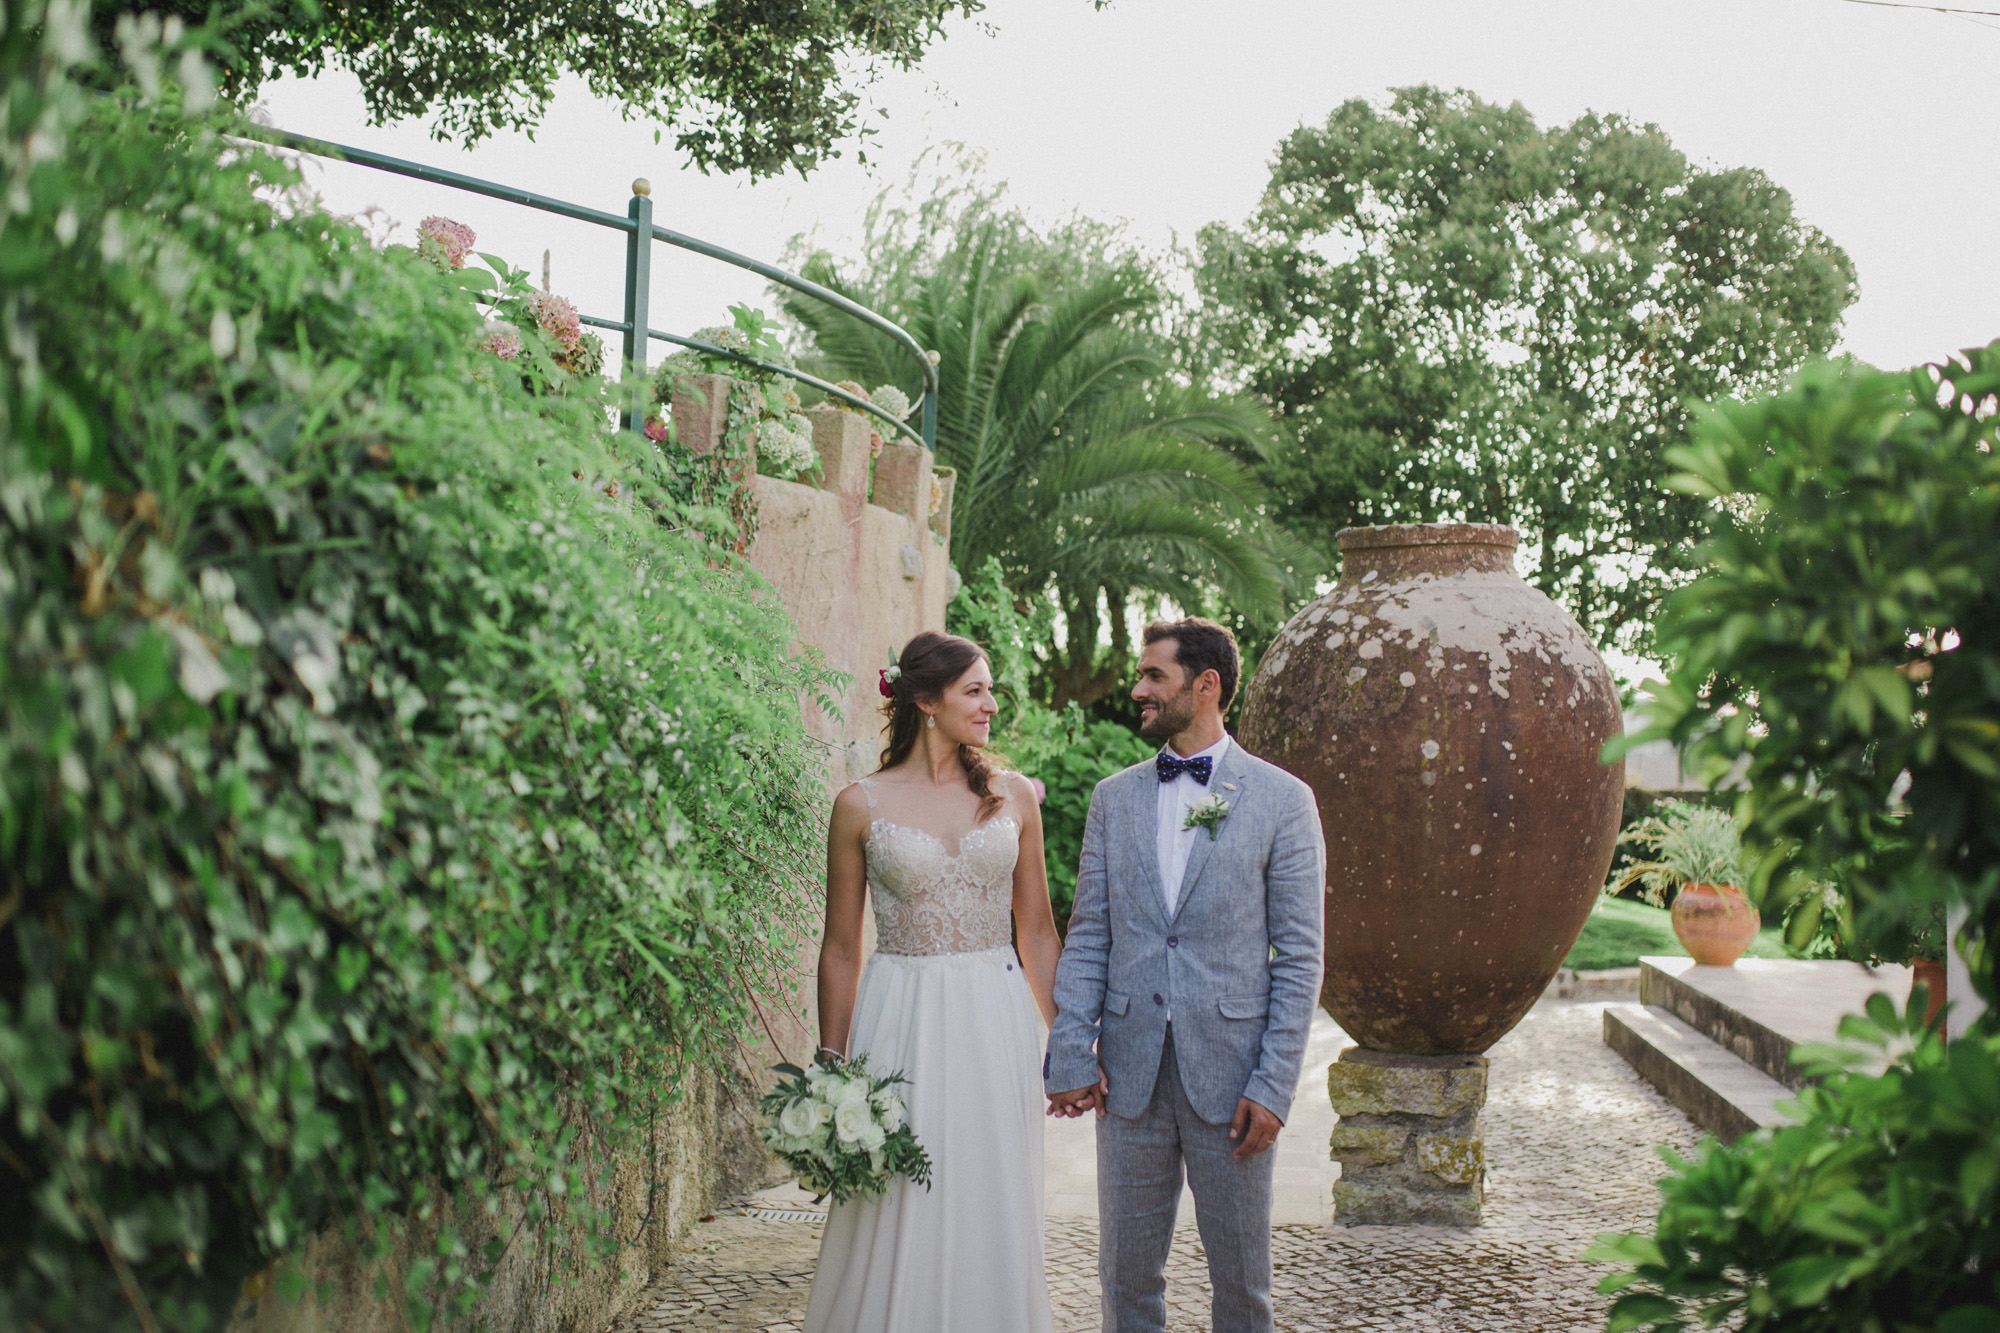 033-carina-e-samuel-wedding-casamento-quinta-dos-rouxinois-rustico-my-fancy-wedding-mafra-malveira-lisboa-sintra-cascais-filipe-santiago-fotografia-fotografo-lifestyle-destination-portugal